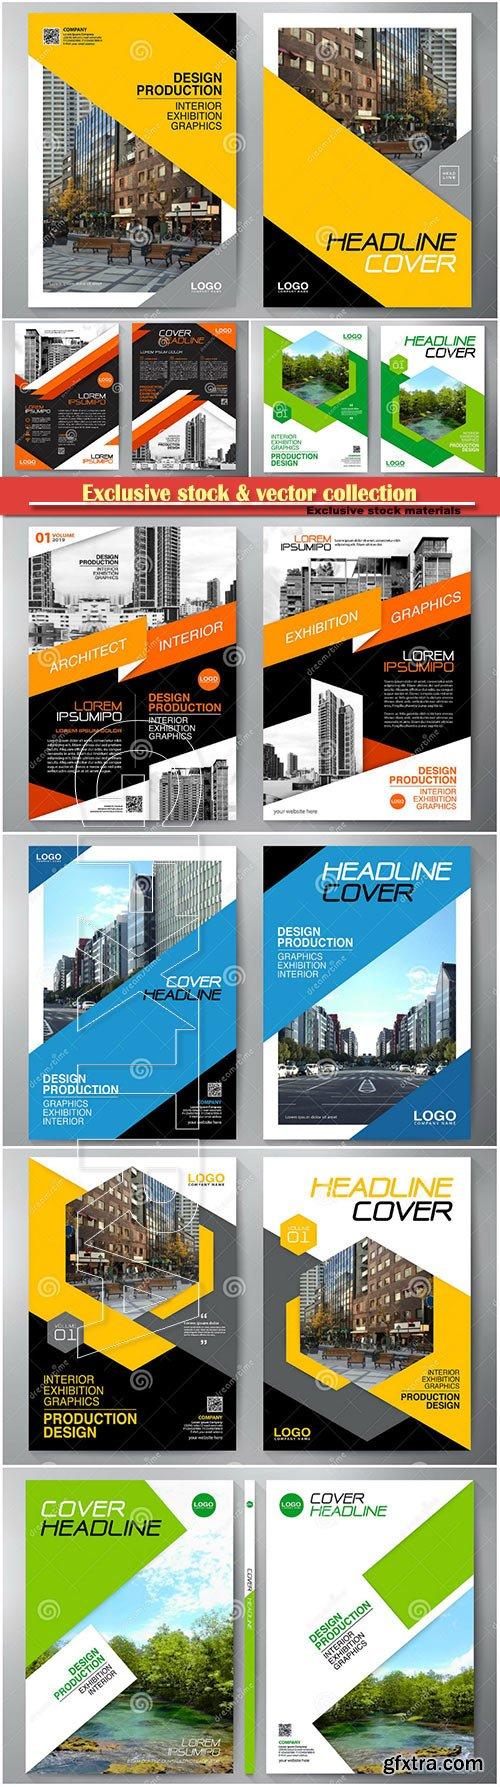 Business brochure, flyer design, leaflets a4 template, cover book